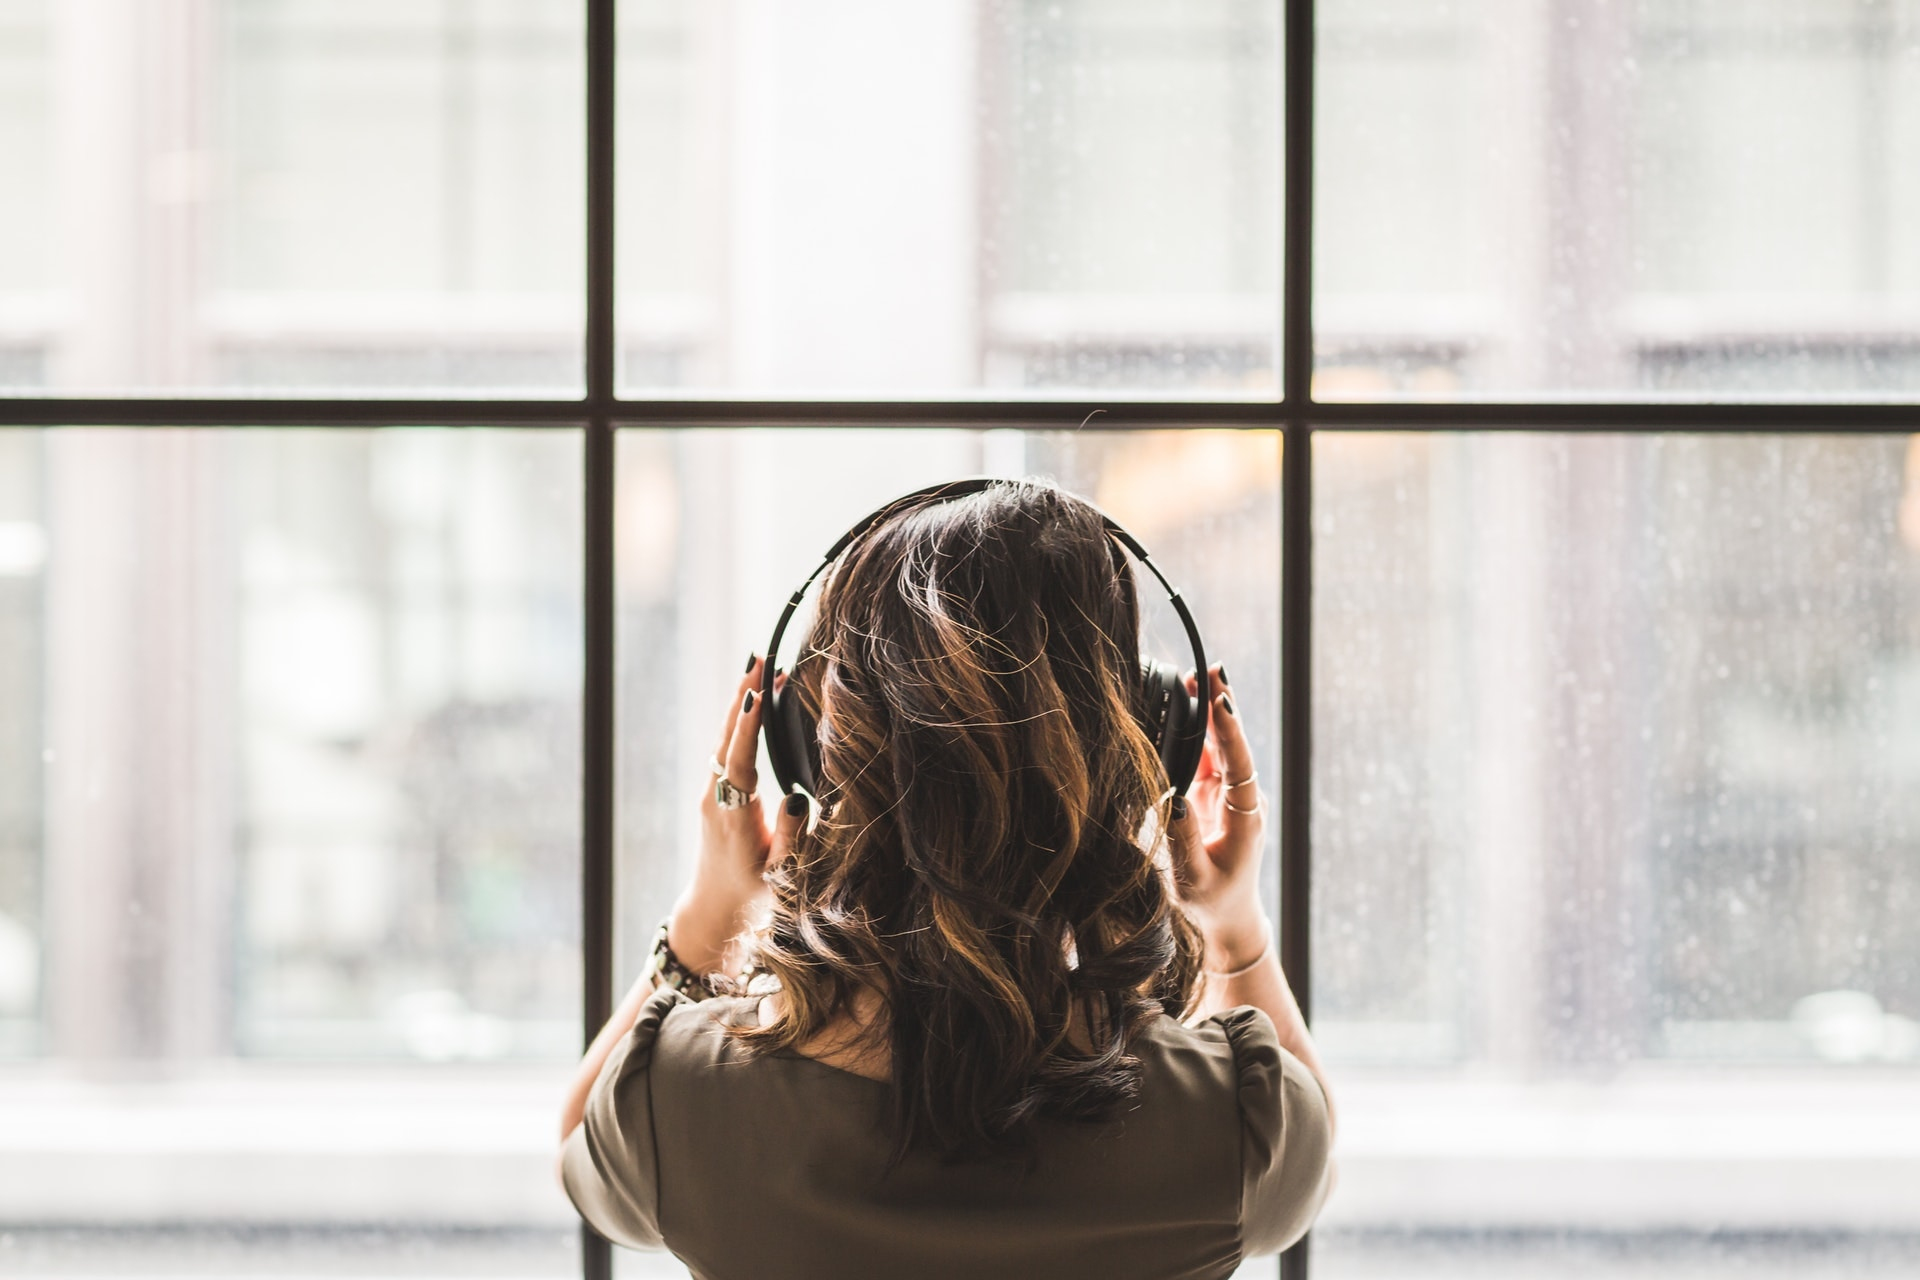 gender discrimination in music industry